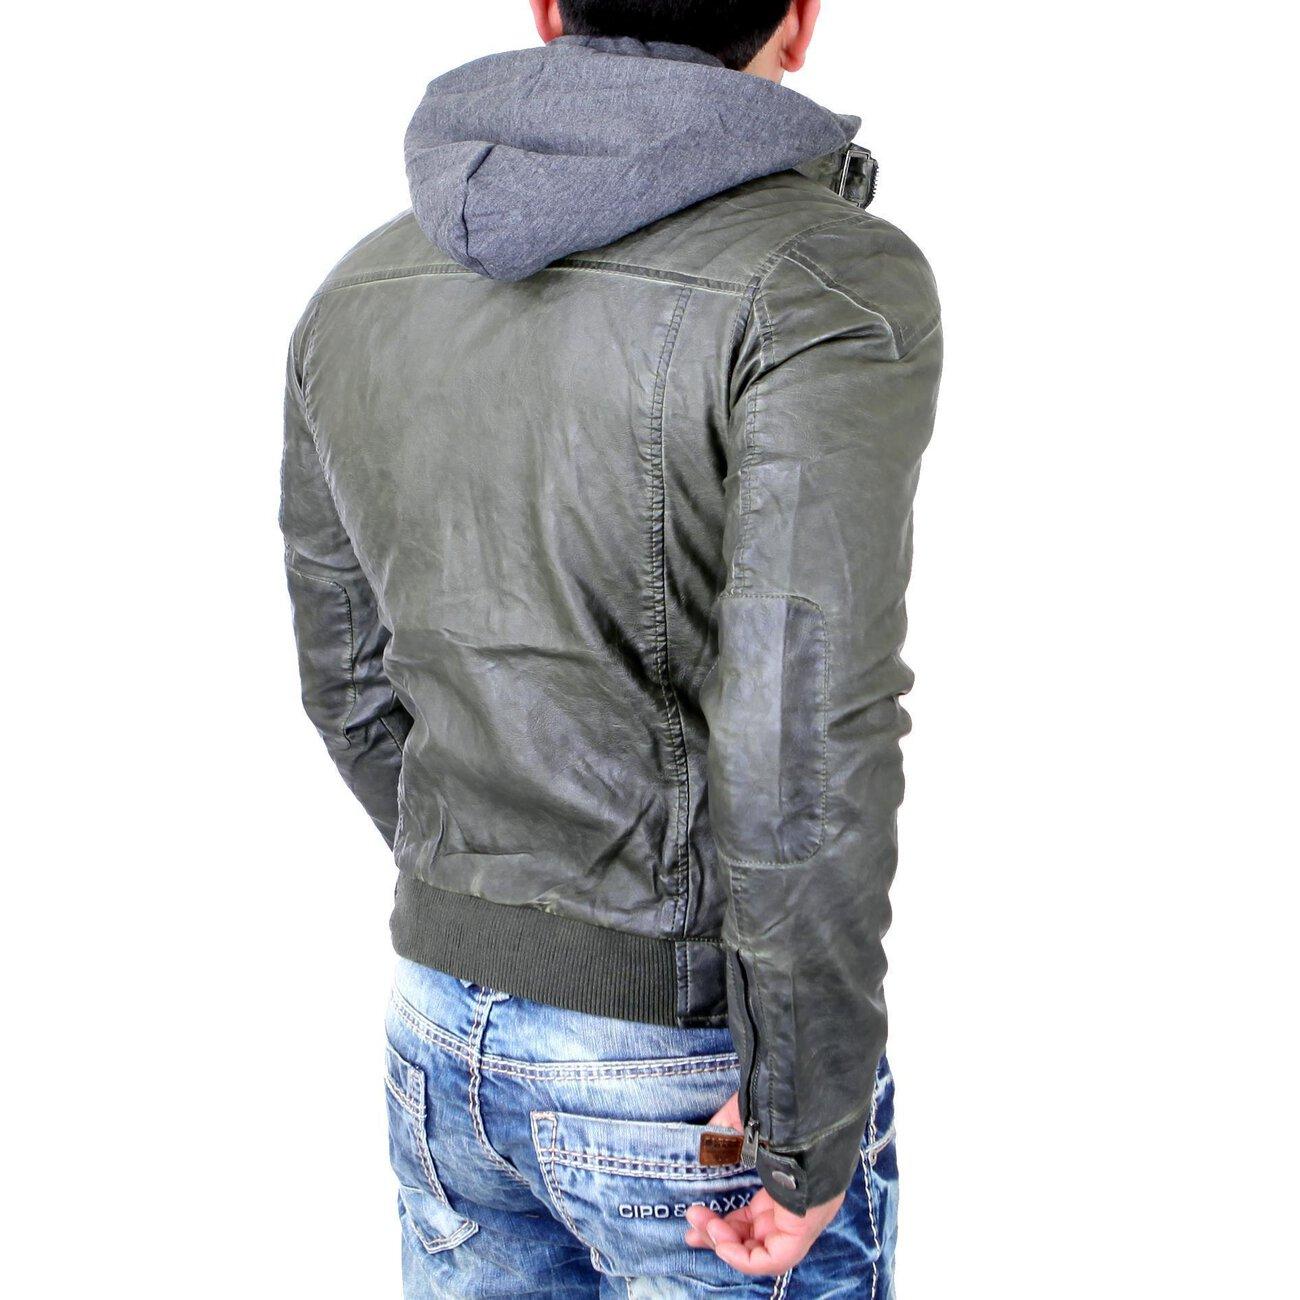 reslad lederjacke herren kunst lederjacke abnehmbarer kapuzen sweater. Black Bedroom Furniture Sets. Home Design Ideas